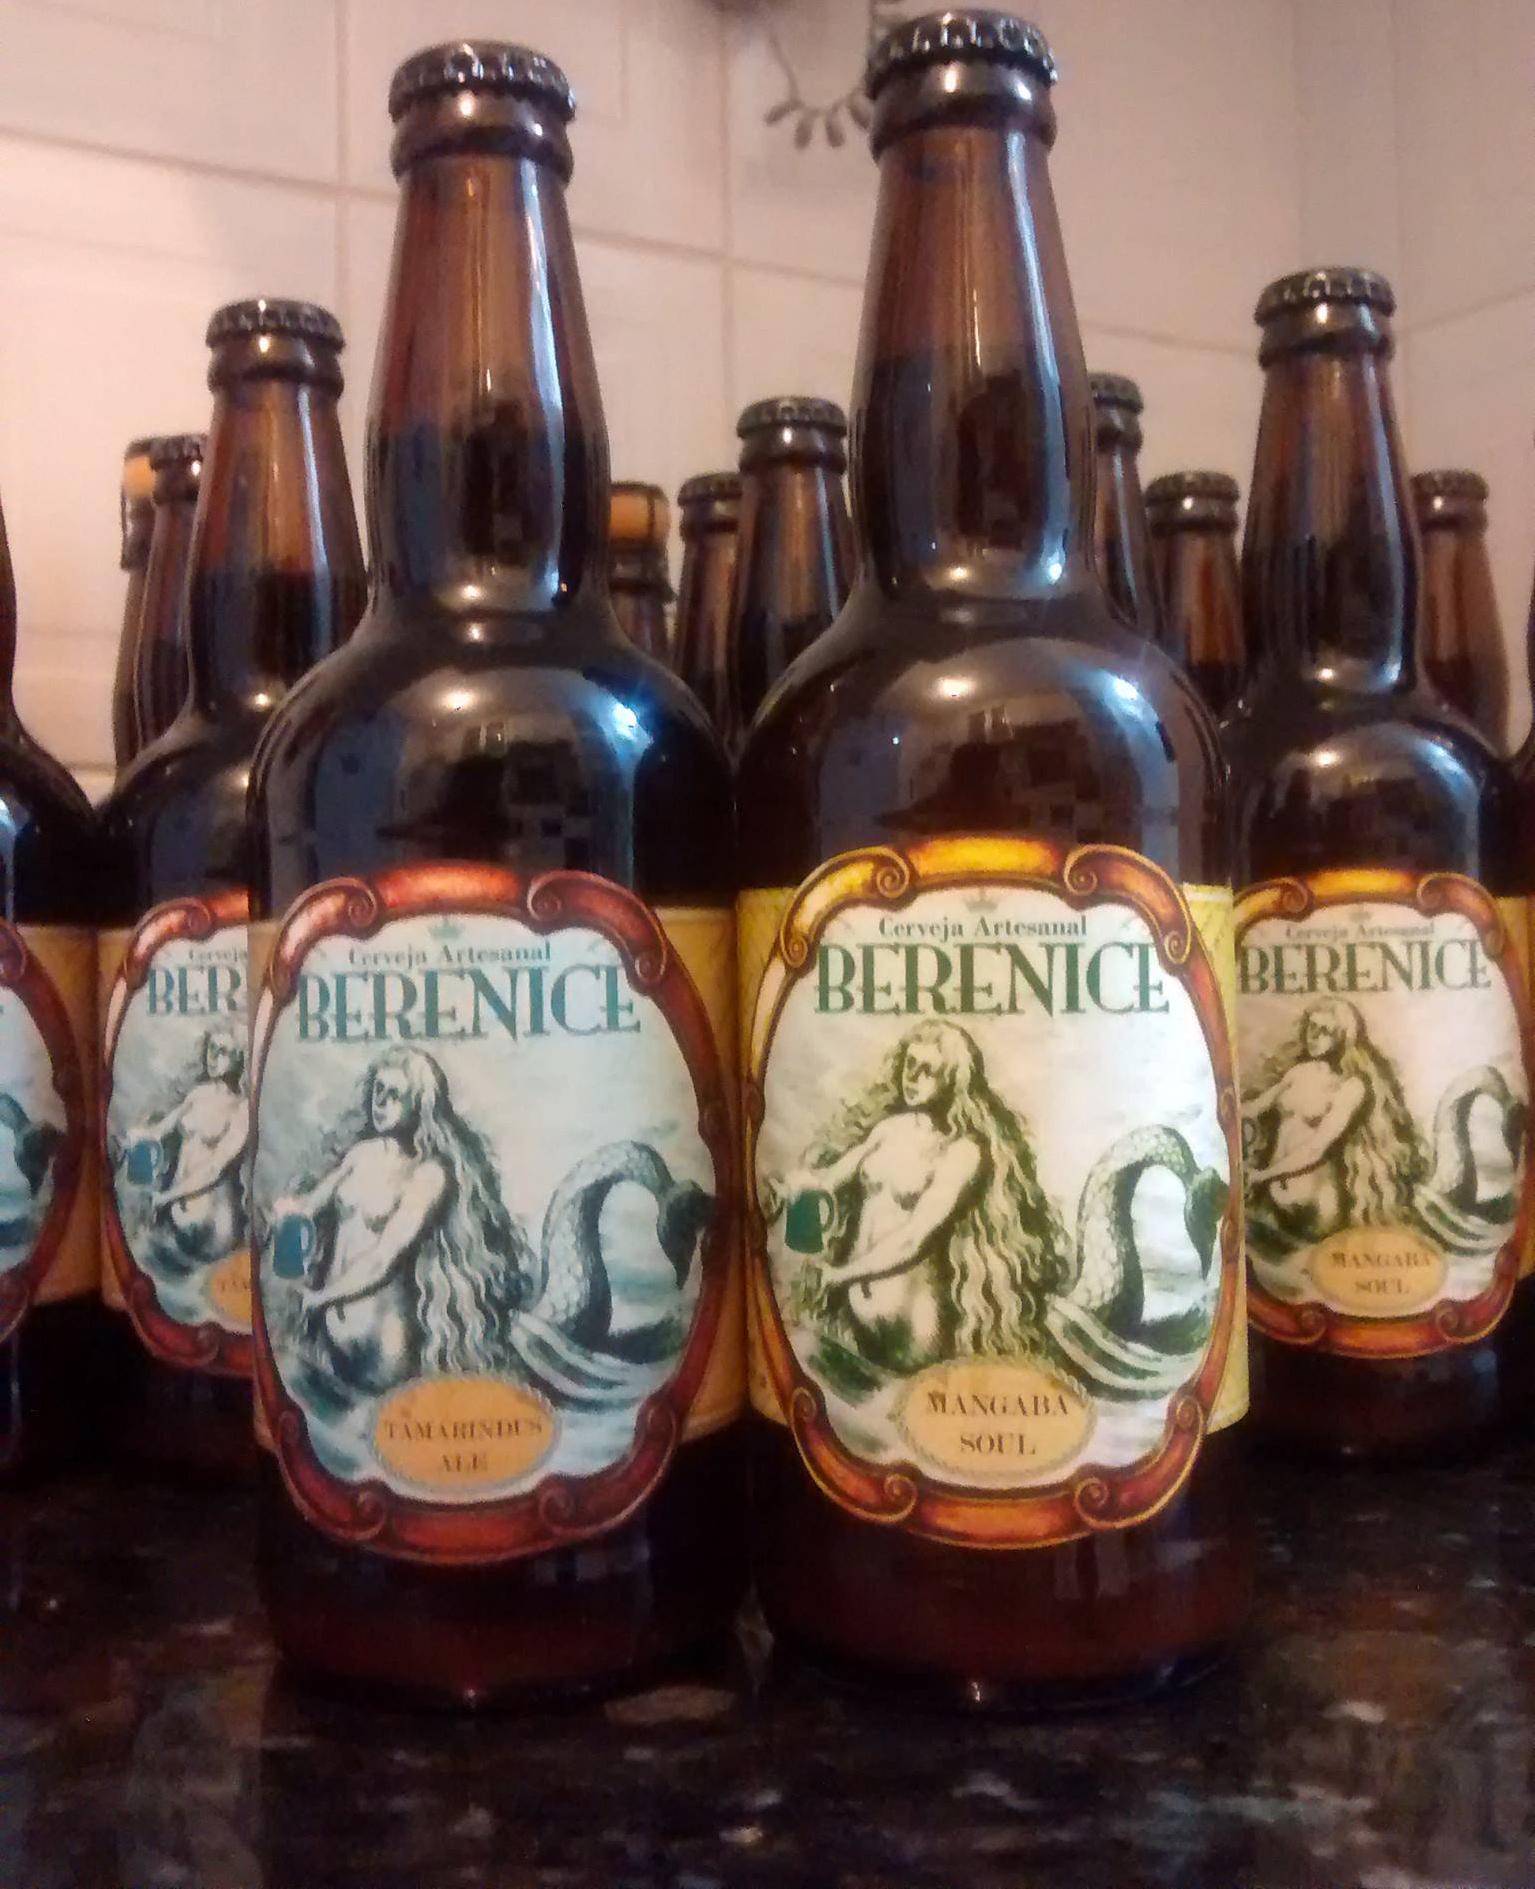 Cervejaria-Berenice